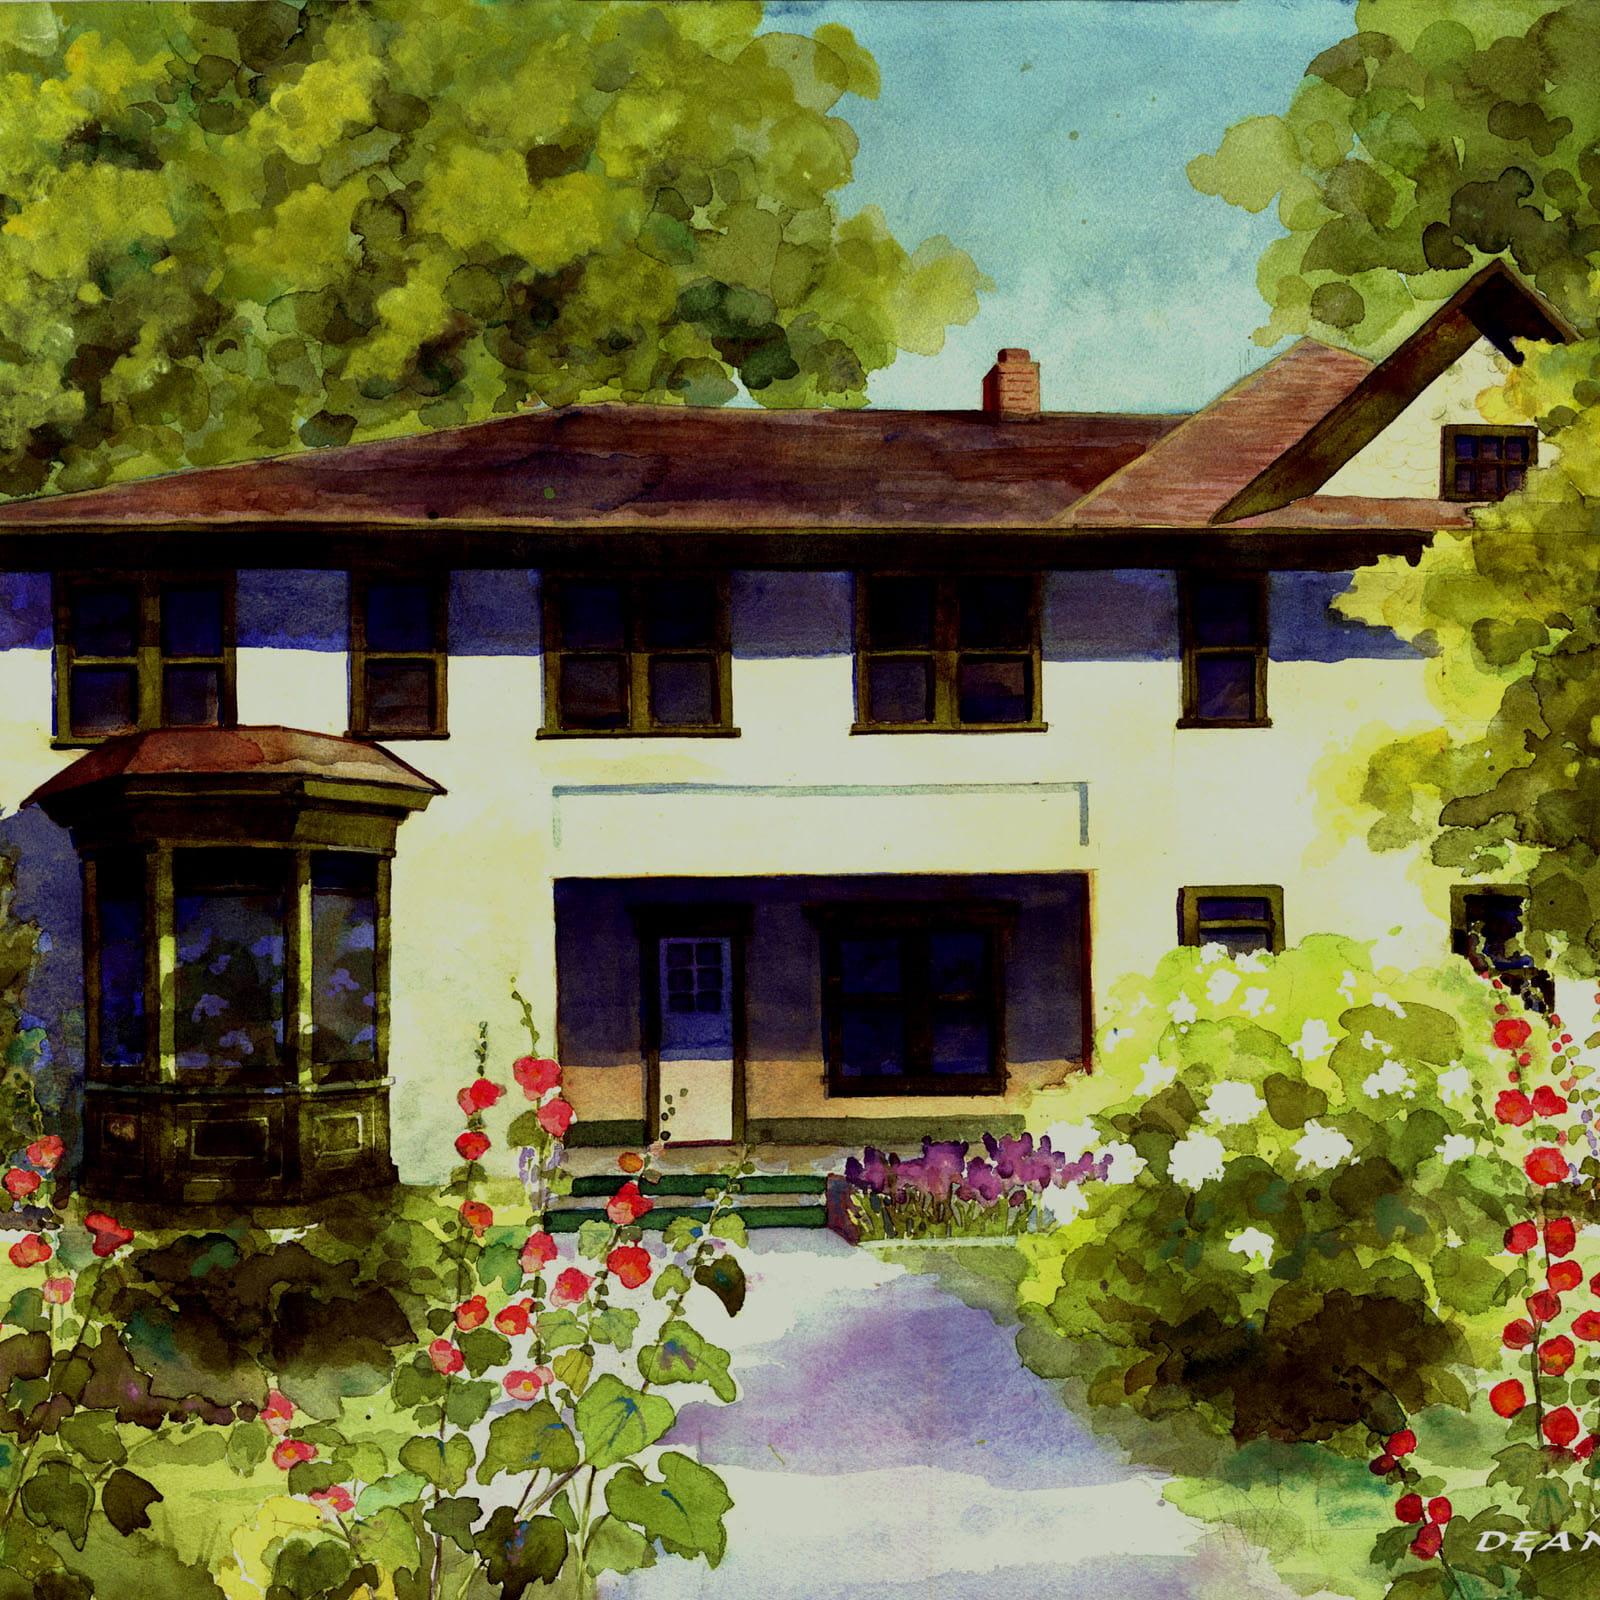 McGregor painting